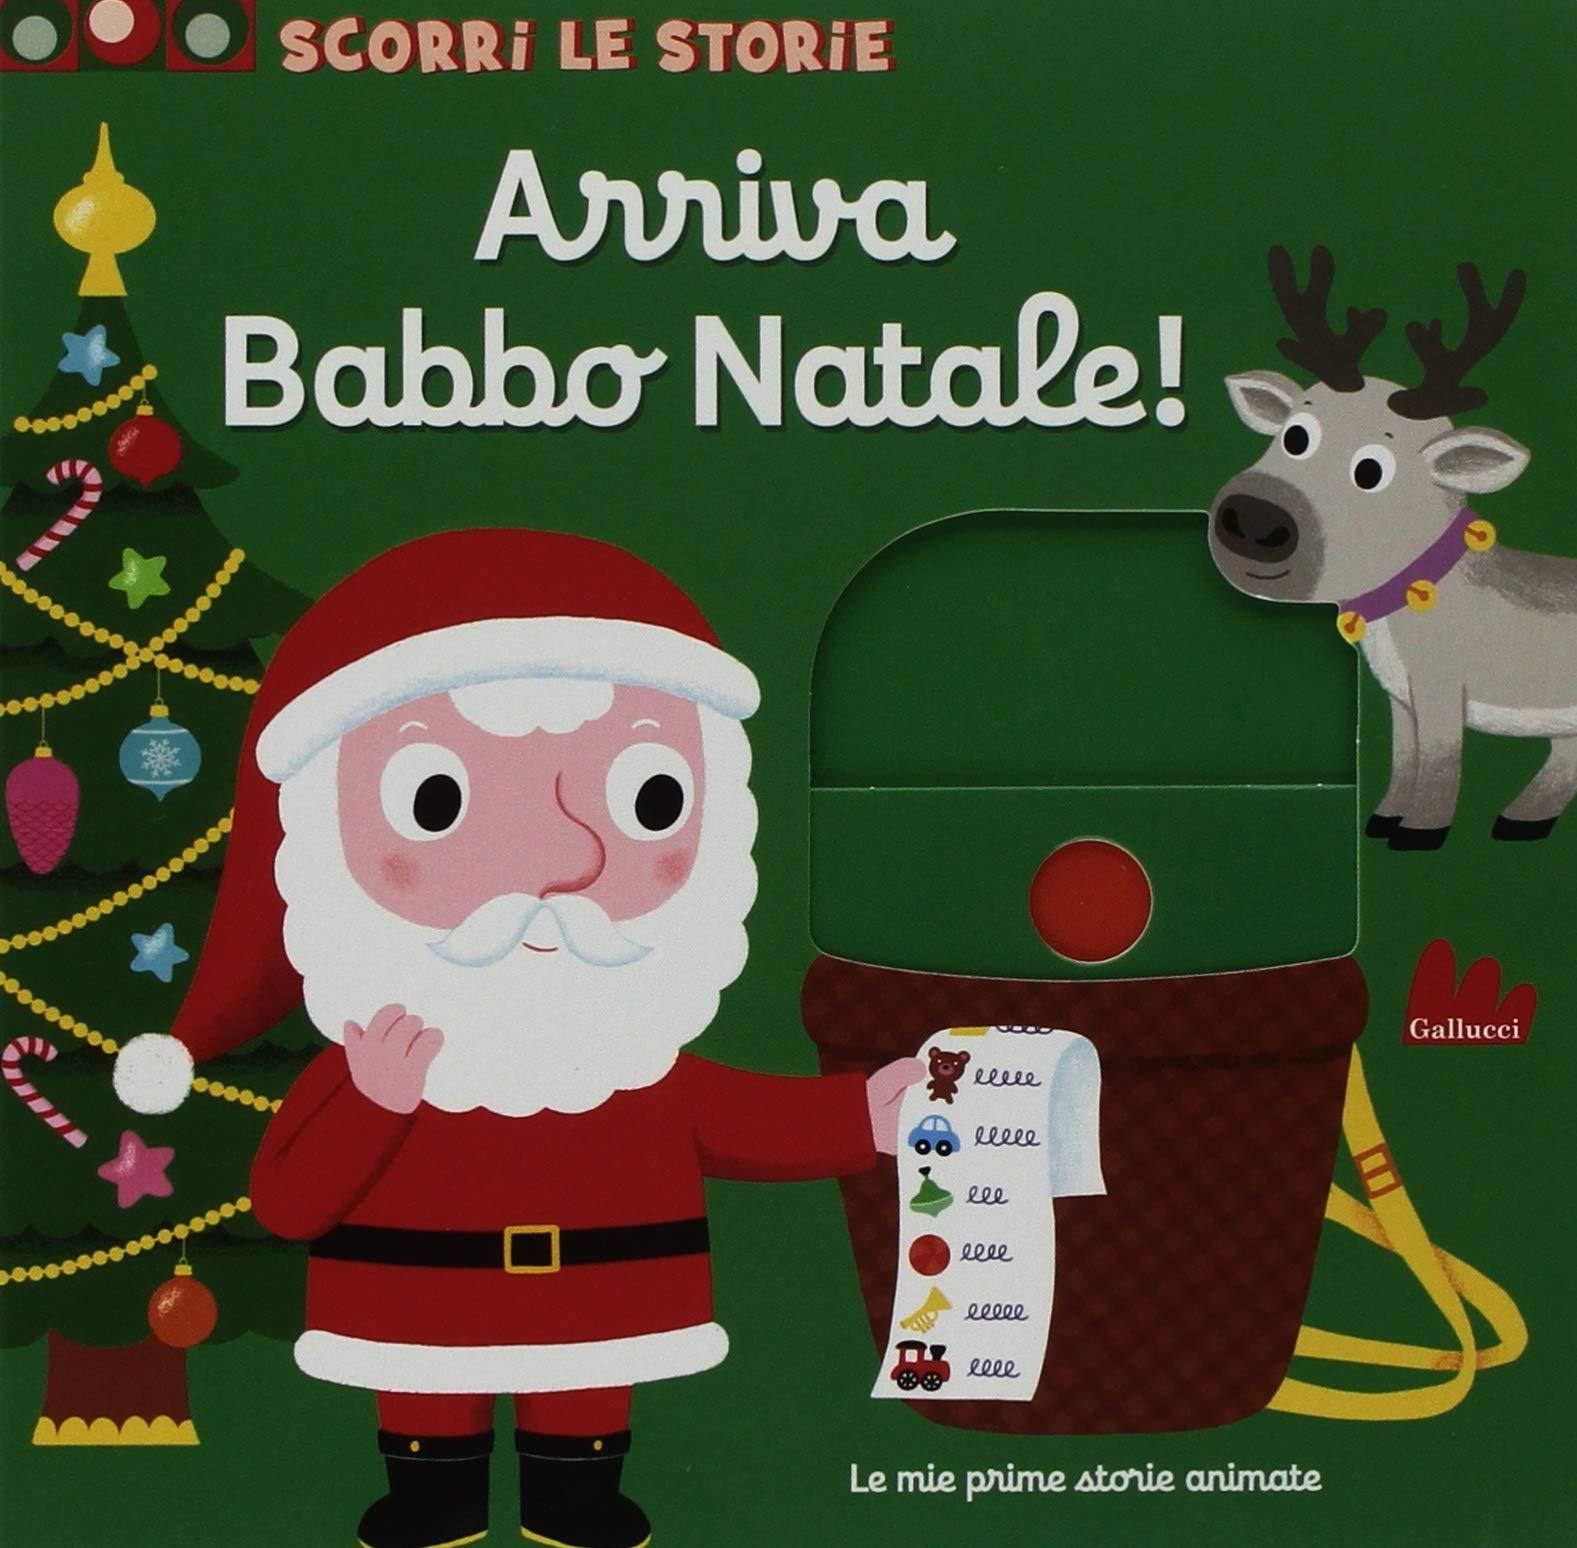 Le Storie Di Babbo Natale.Amazon It Arriva Babbo Natale Scorri Le Storie Ediz A Colori Choux Nathalie Libri